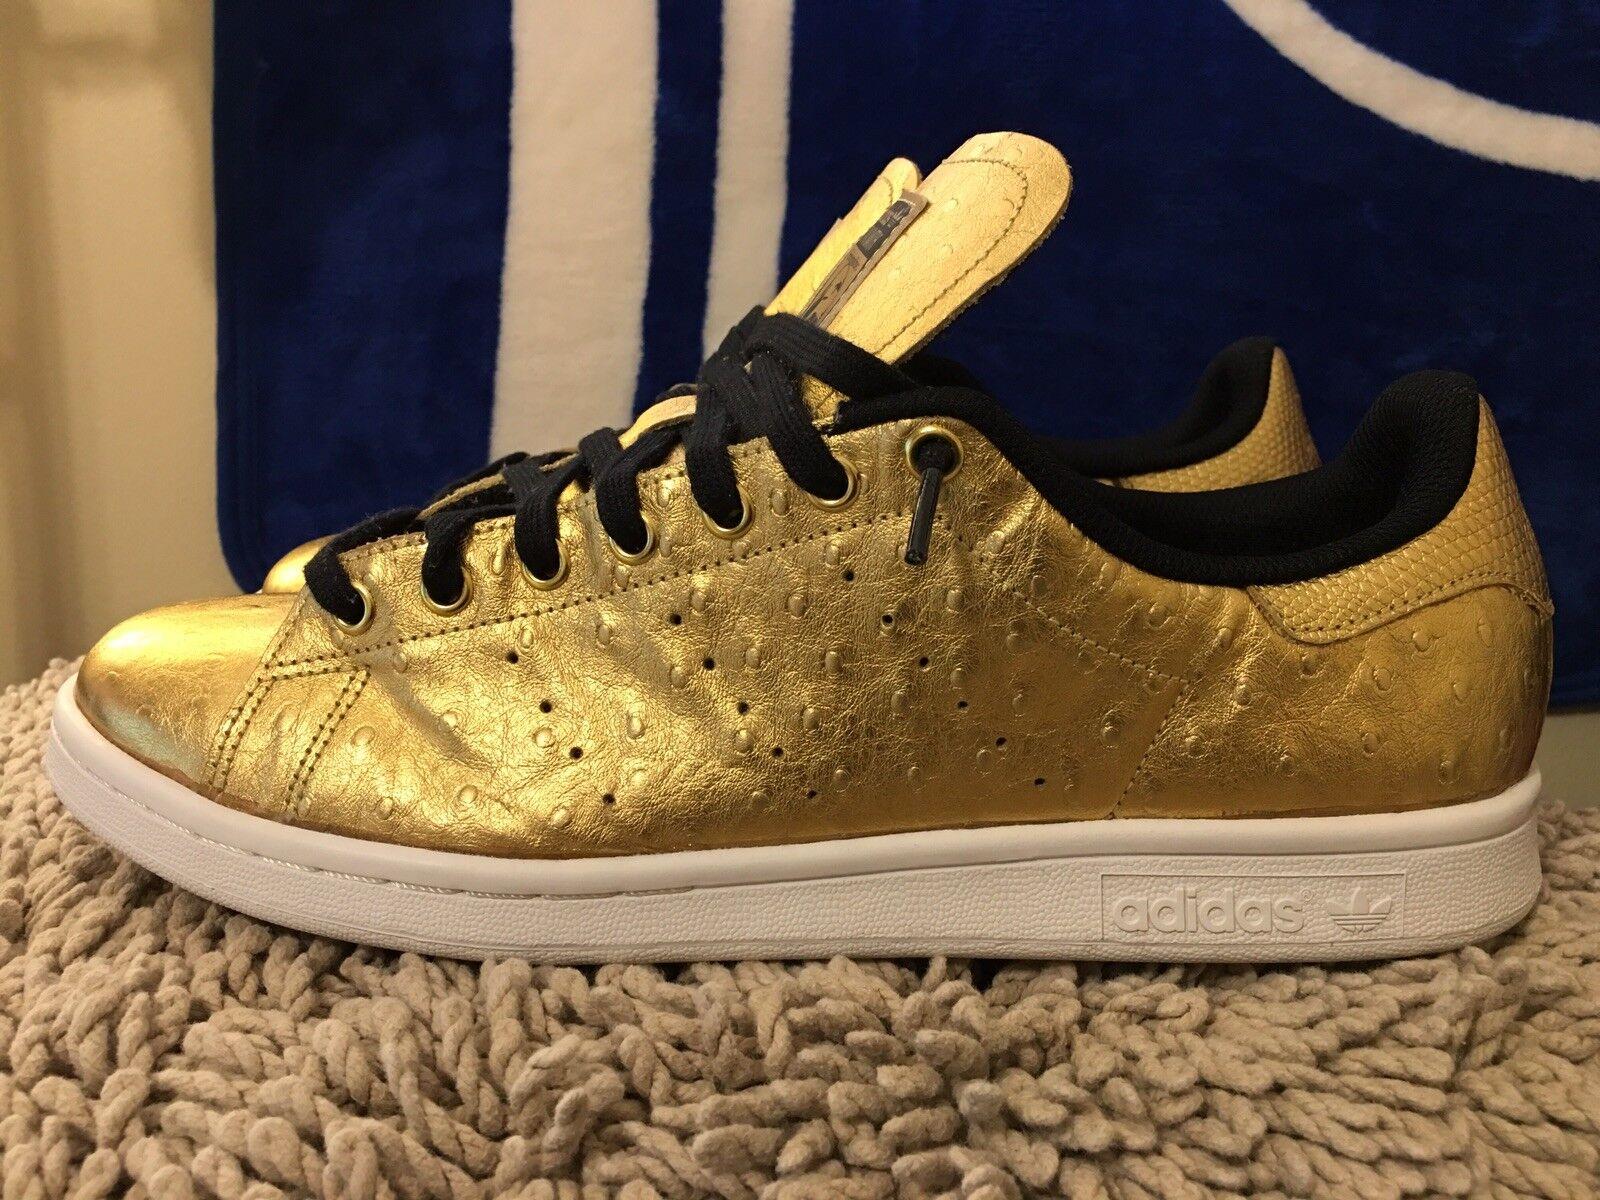 Adidas Originals Stan Smith, Art No. AQ4705, Metallic gold, Men's Size 11.5